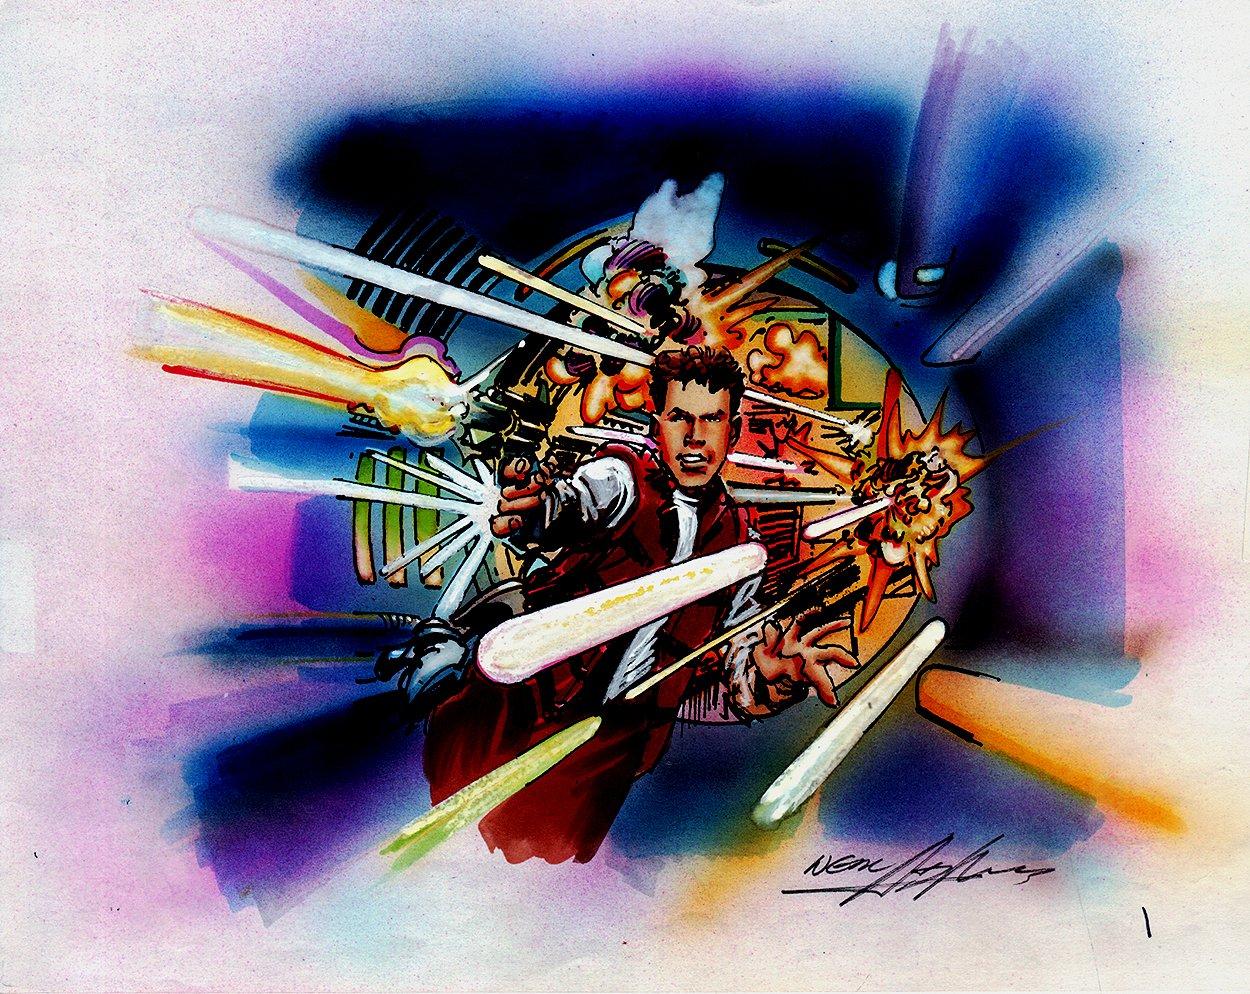 Buckaroo Banzai Penciled, Inked, & Hand Colored Battle Pinup